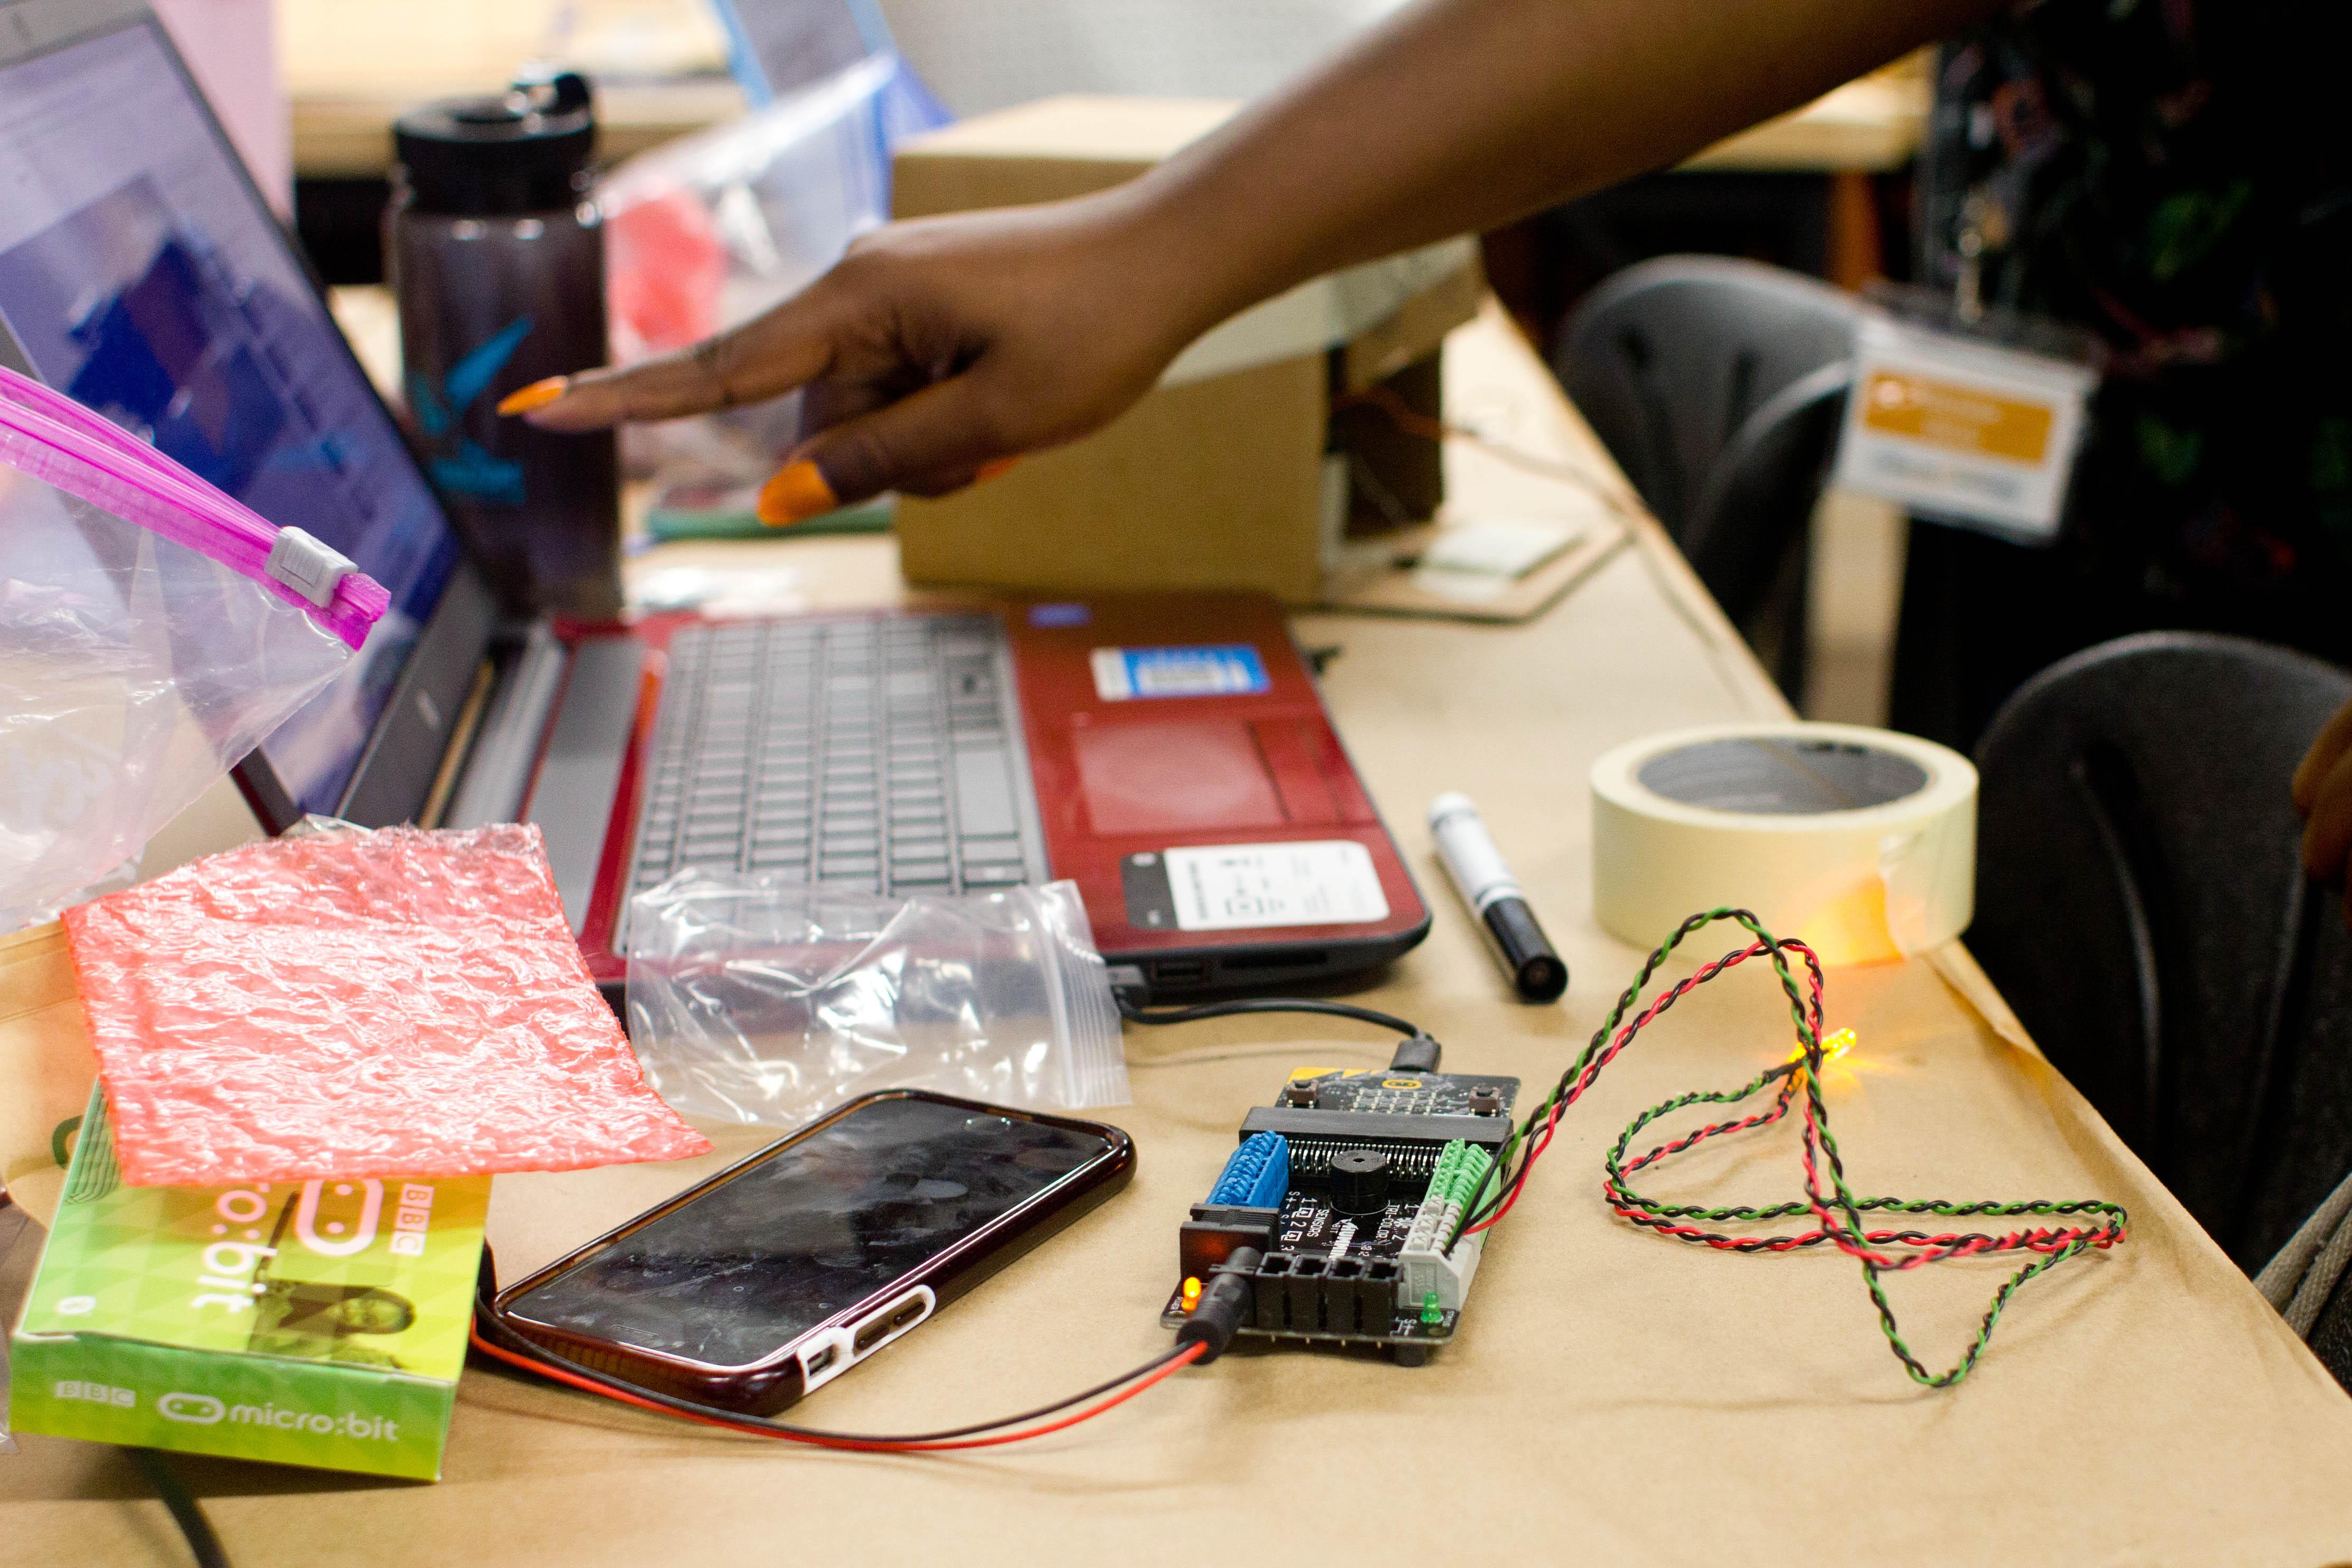 Hummingbird Robotics Kit Birdbrain Technologies Electronic Hobby Kits Electronics Projects